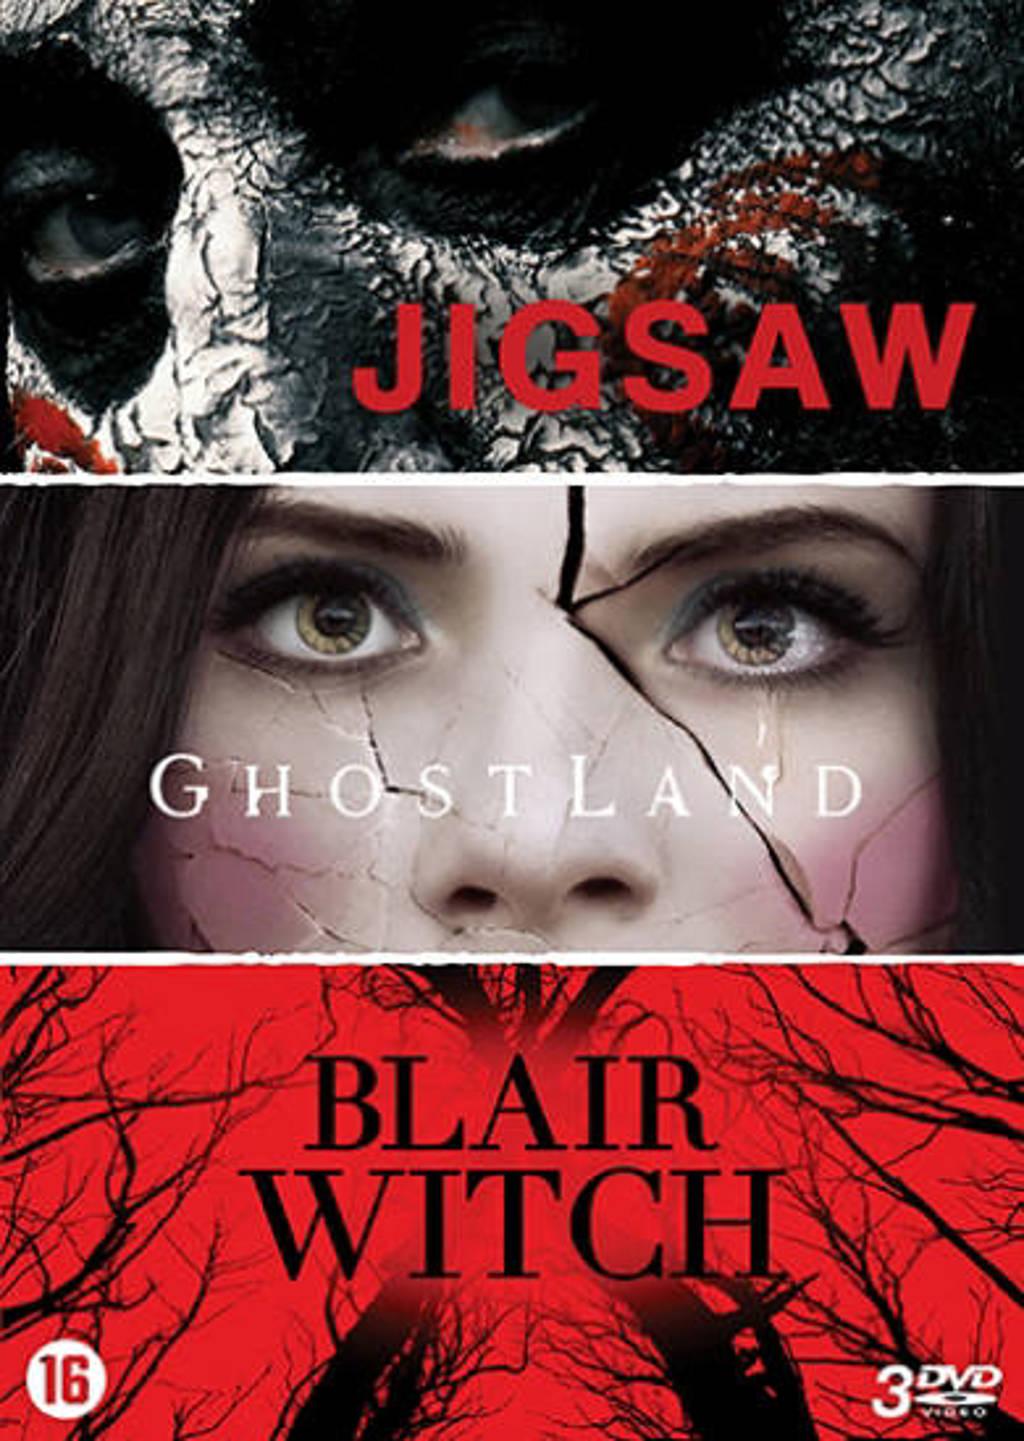 Jigsaw + Ghostland + Blair witch  (DVD)